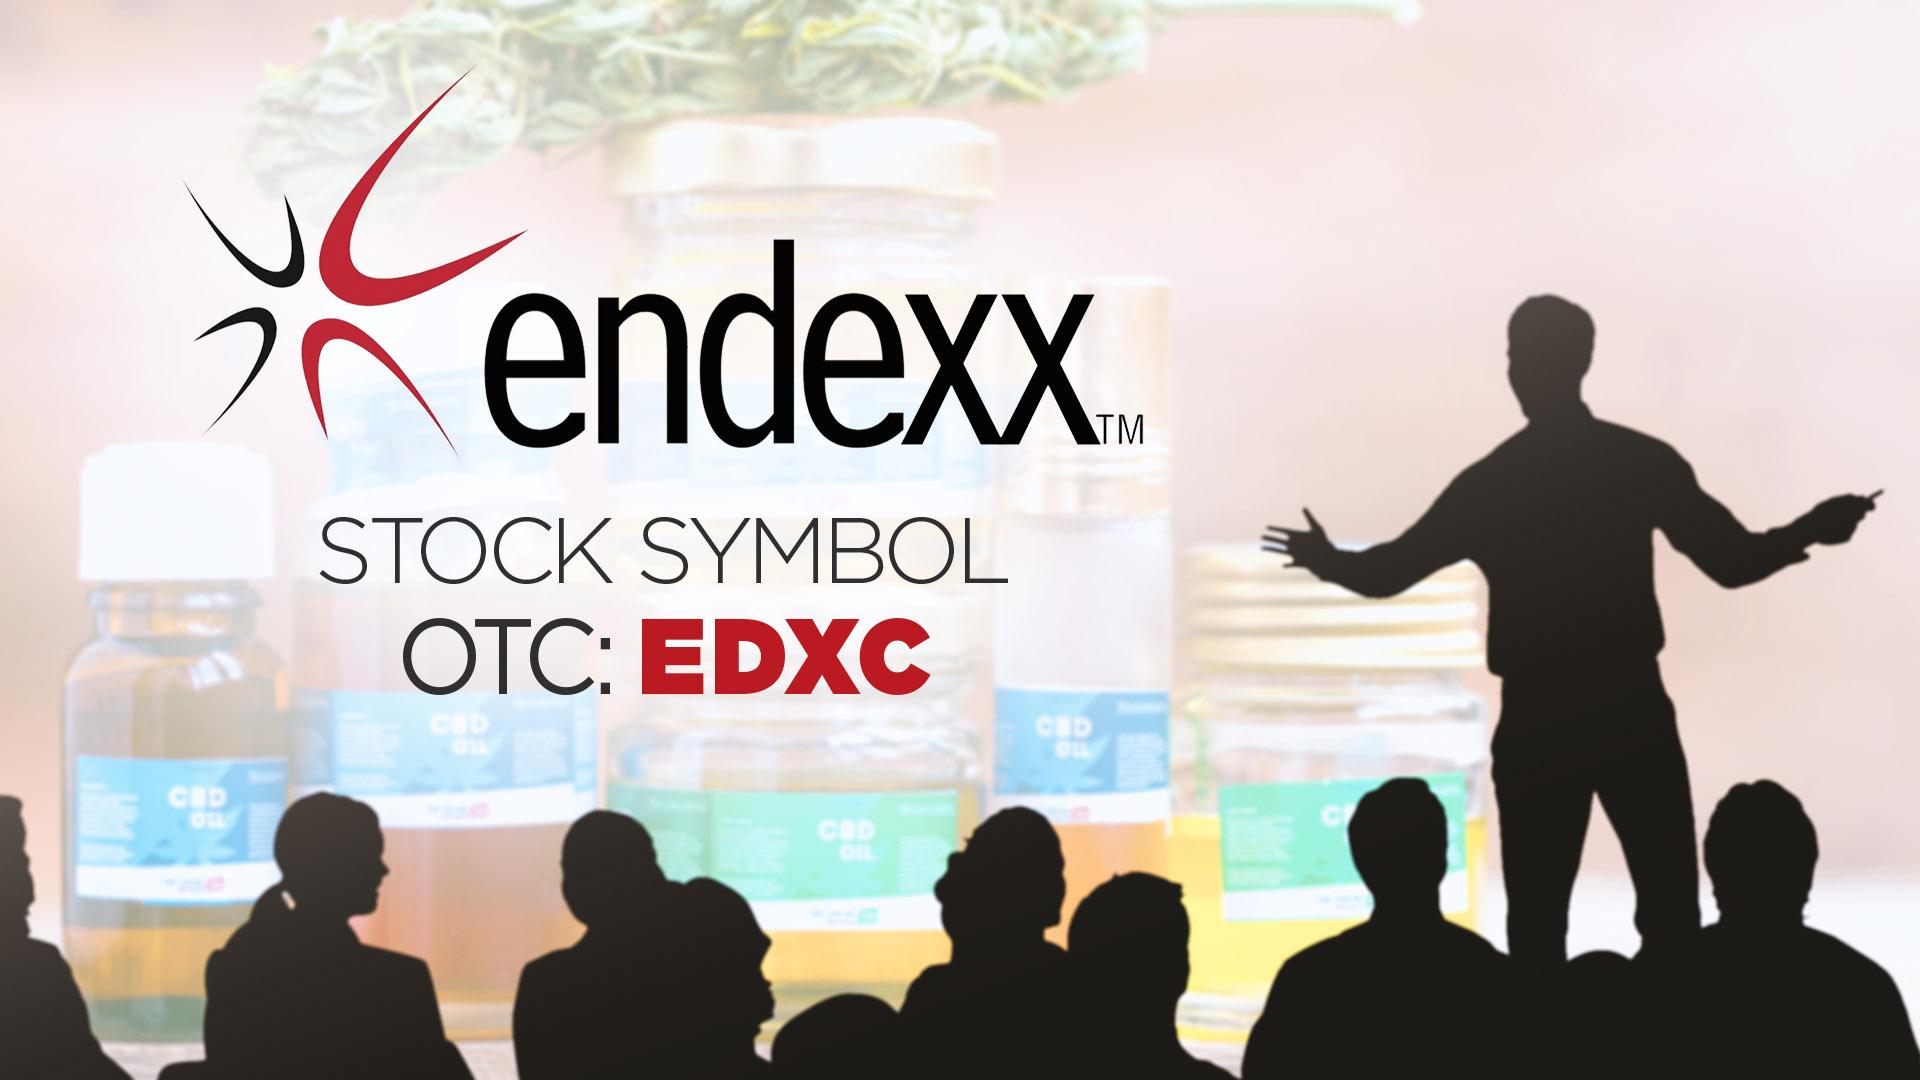 Endexx Corporation Webinar